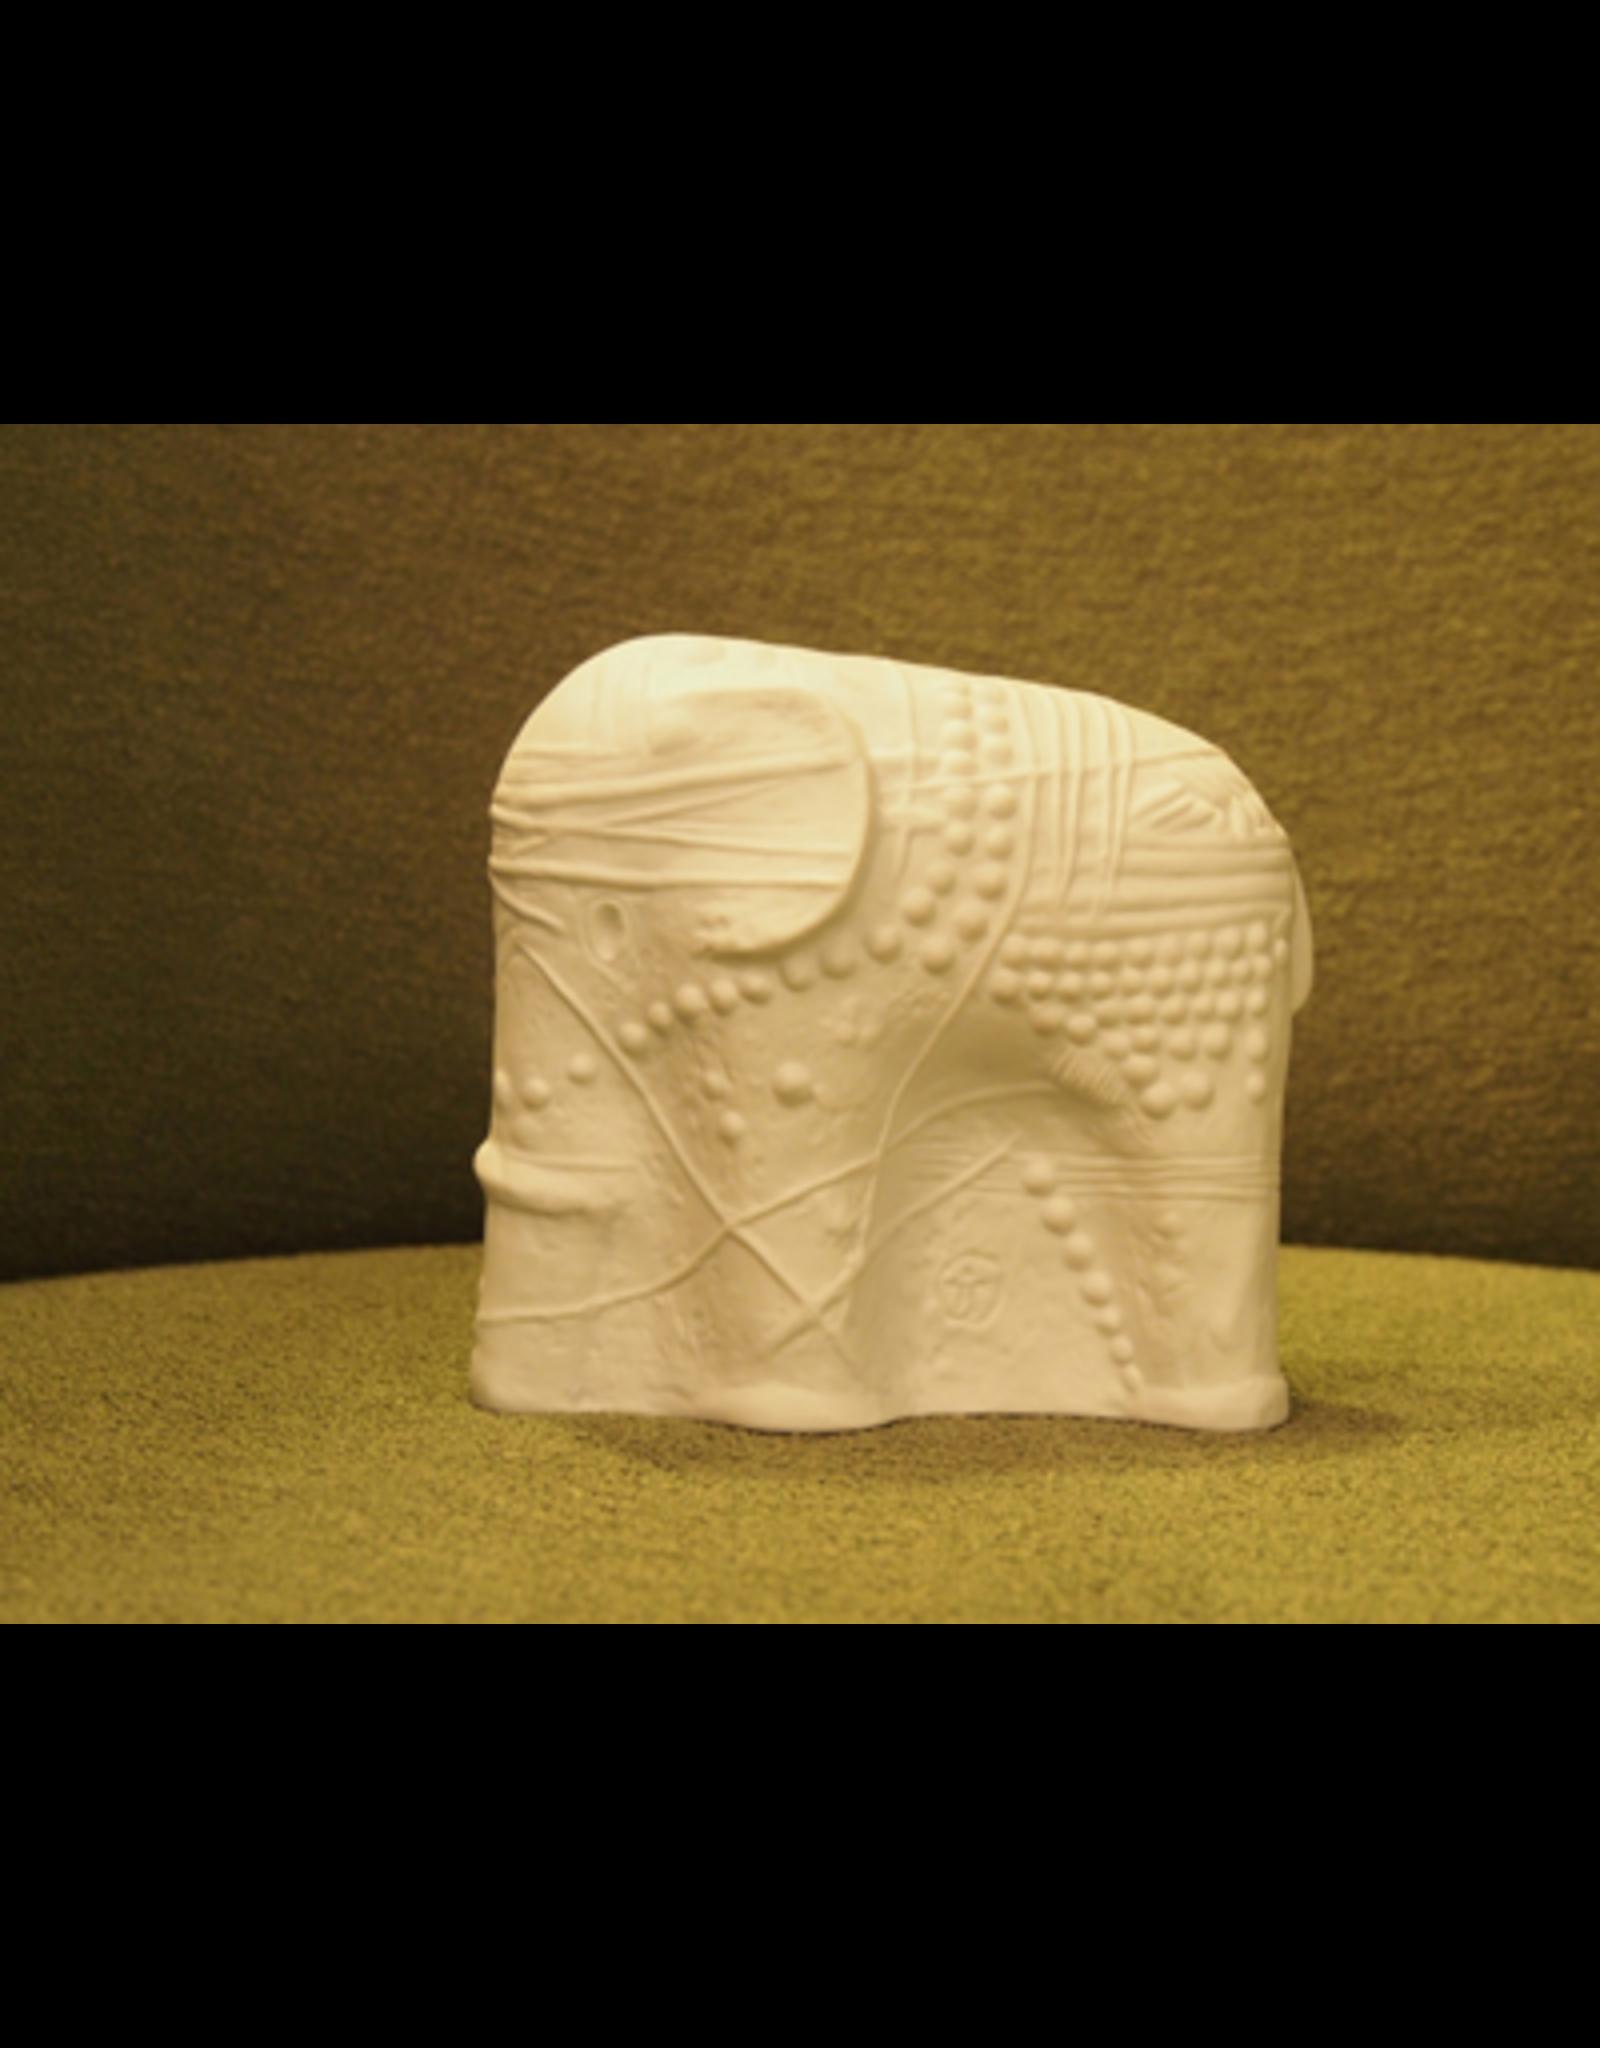 CERAMIC SCULPTURE OF WHITE ELEPHANT